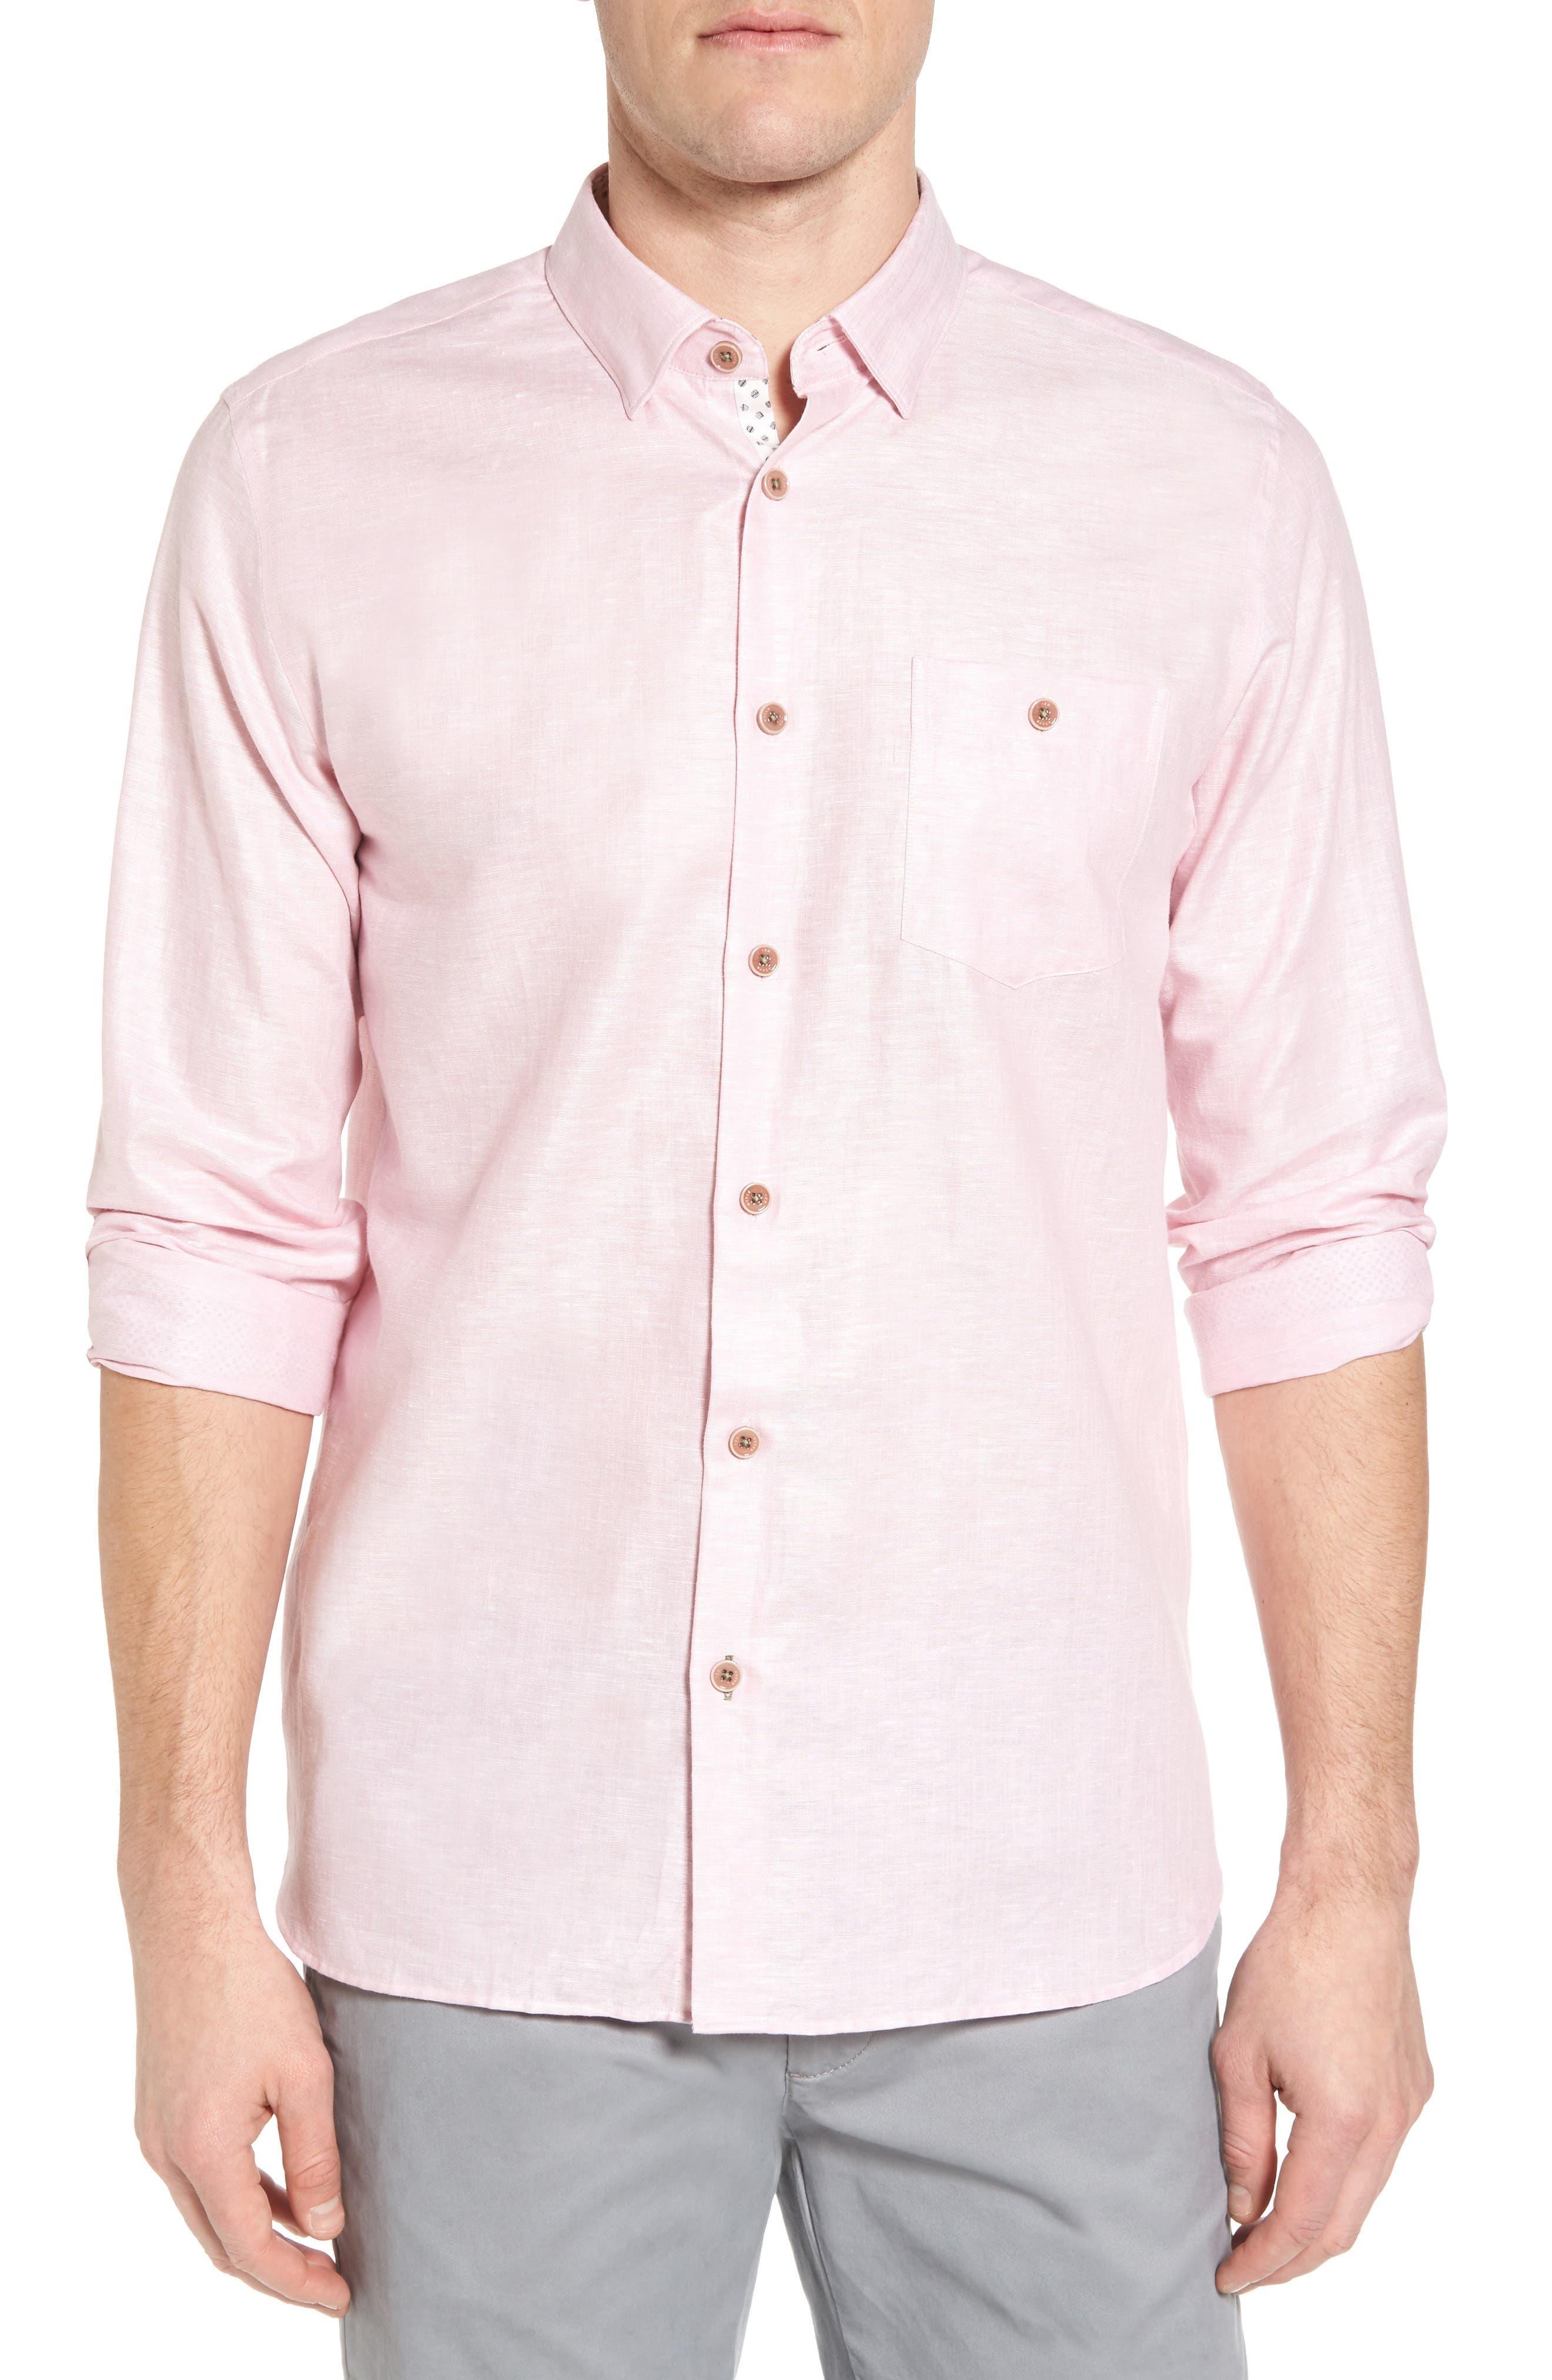 Linlins Herringbone Cotton & Linen Sport Shirt,                             Main thumbnail 5, color,